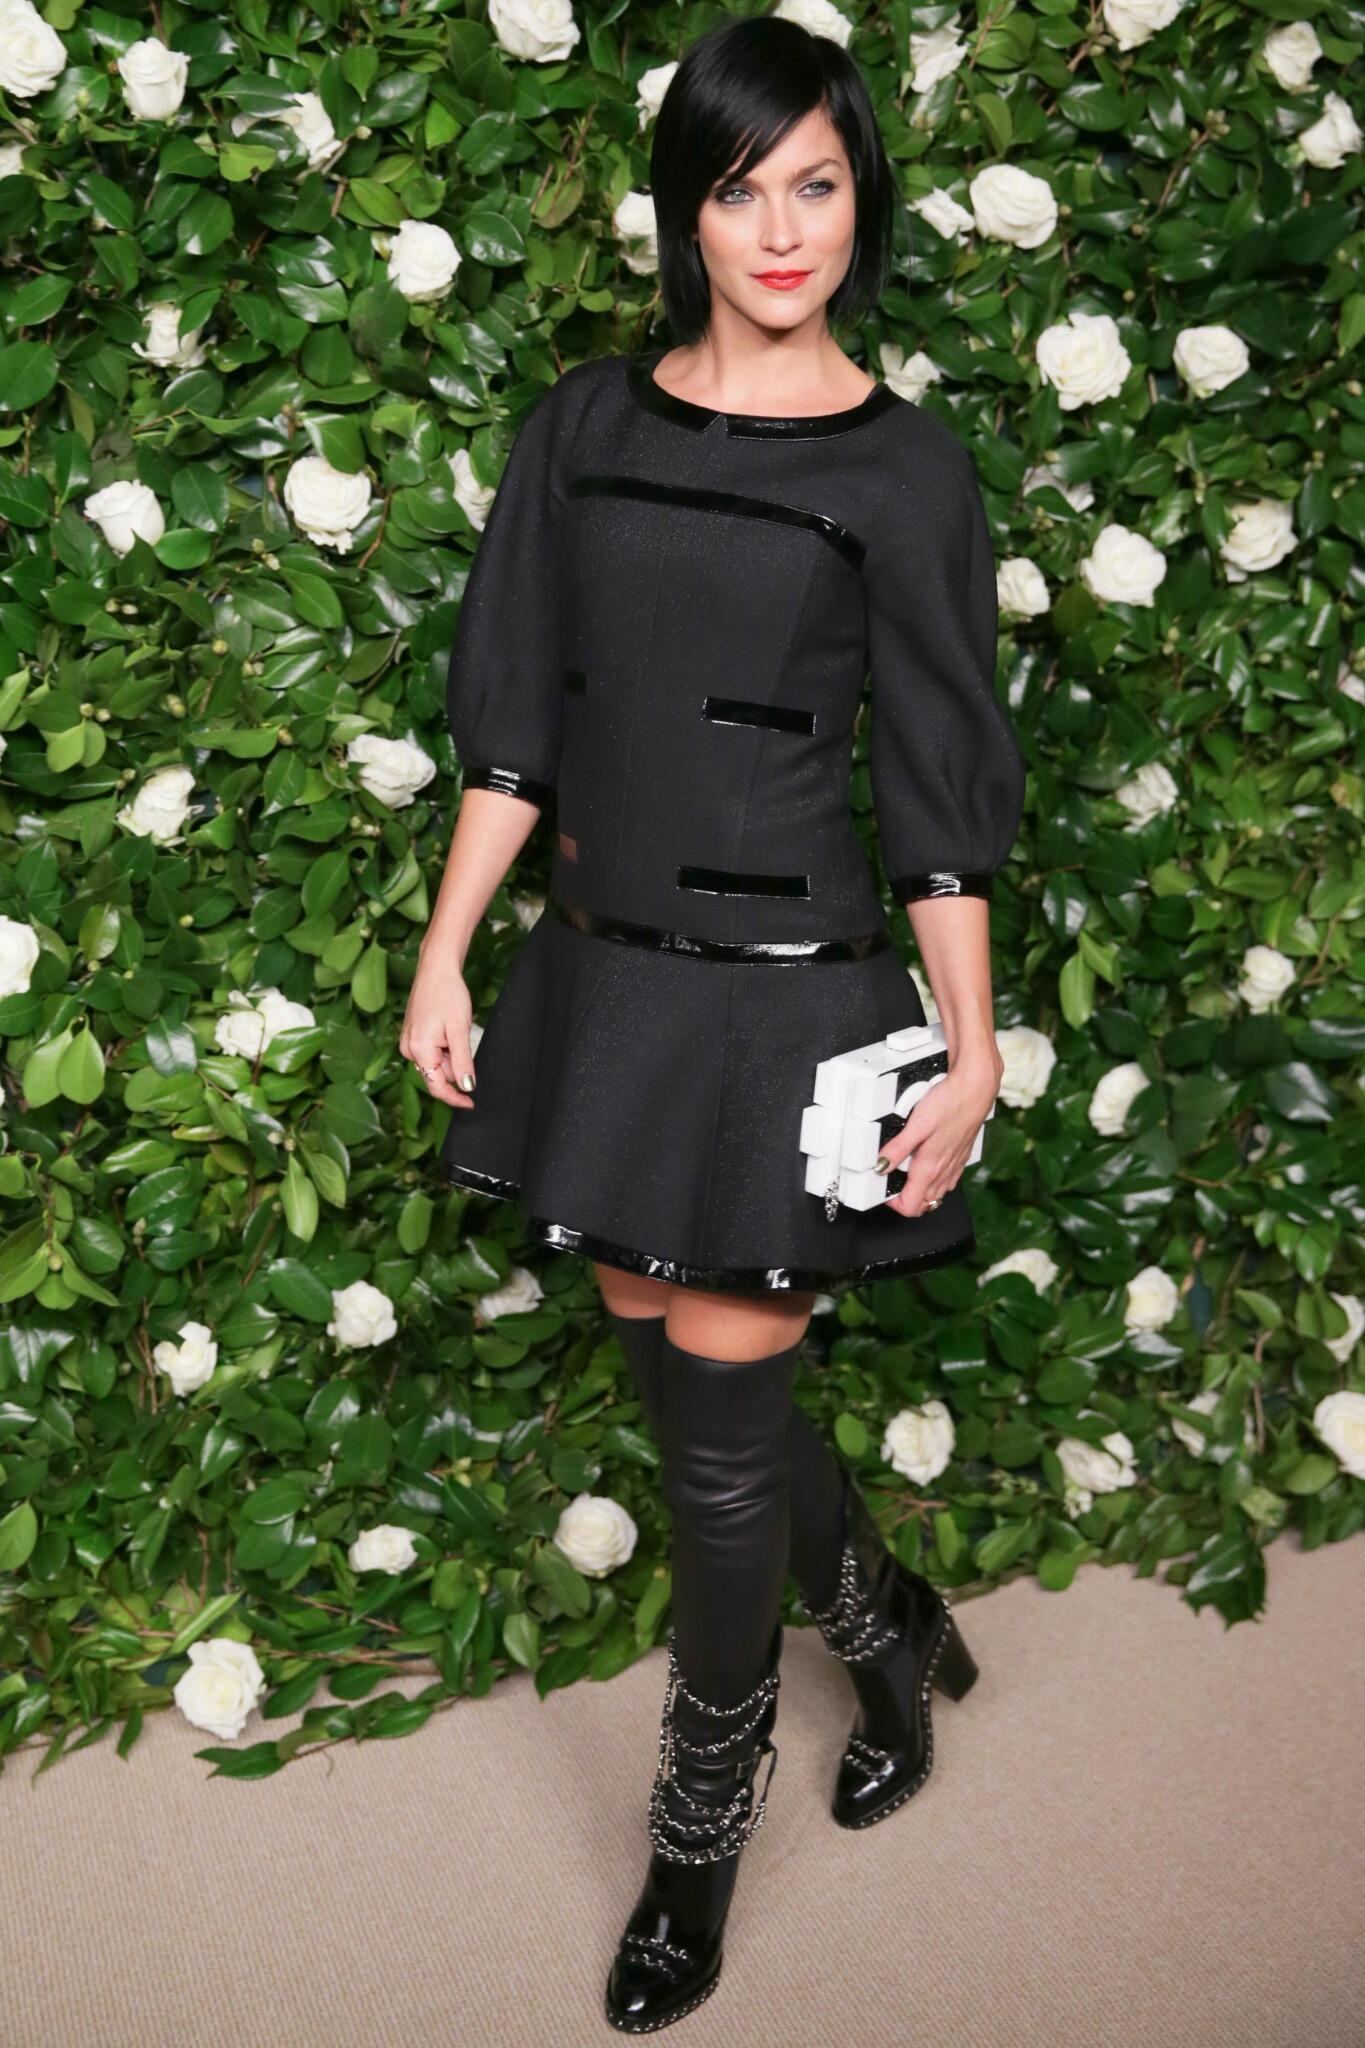 La Fidèle Leigh Lezark from @THEMISSHAPES at last night's #MoMAFilm gala wearing a black dress from 2013/14 F/W RTW http://t.co/3Ylx5UI5LD